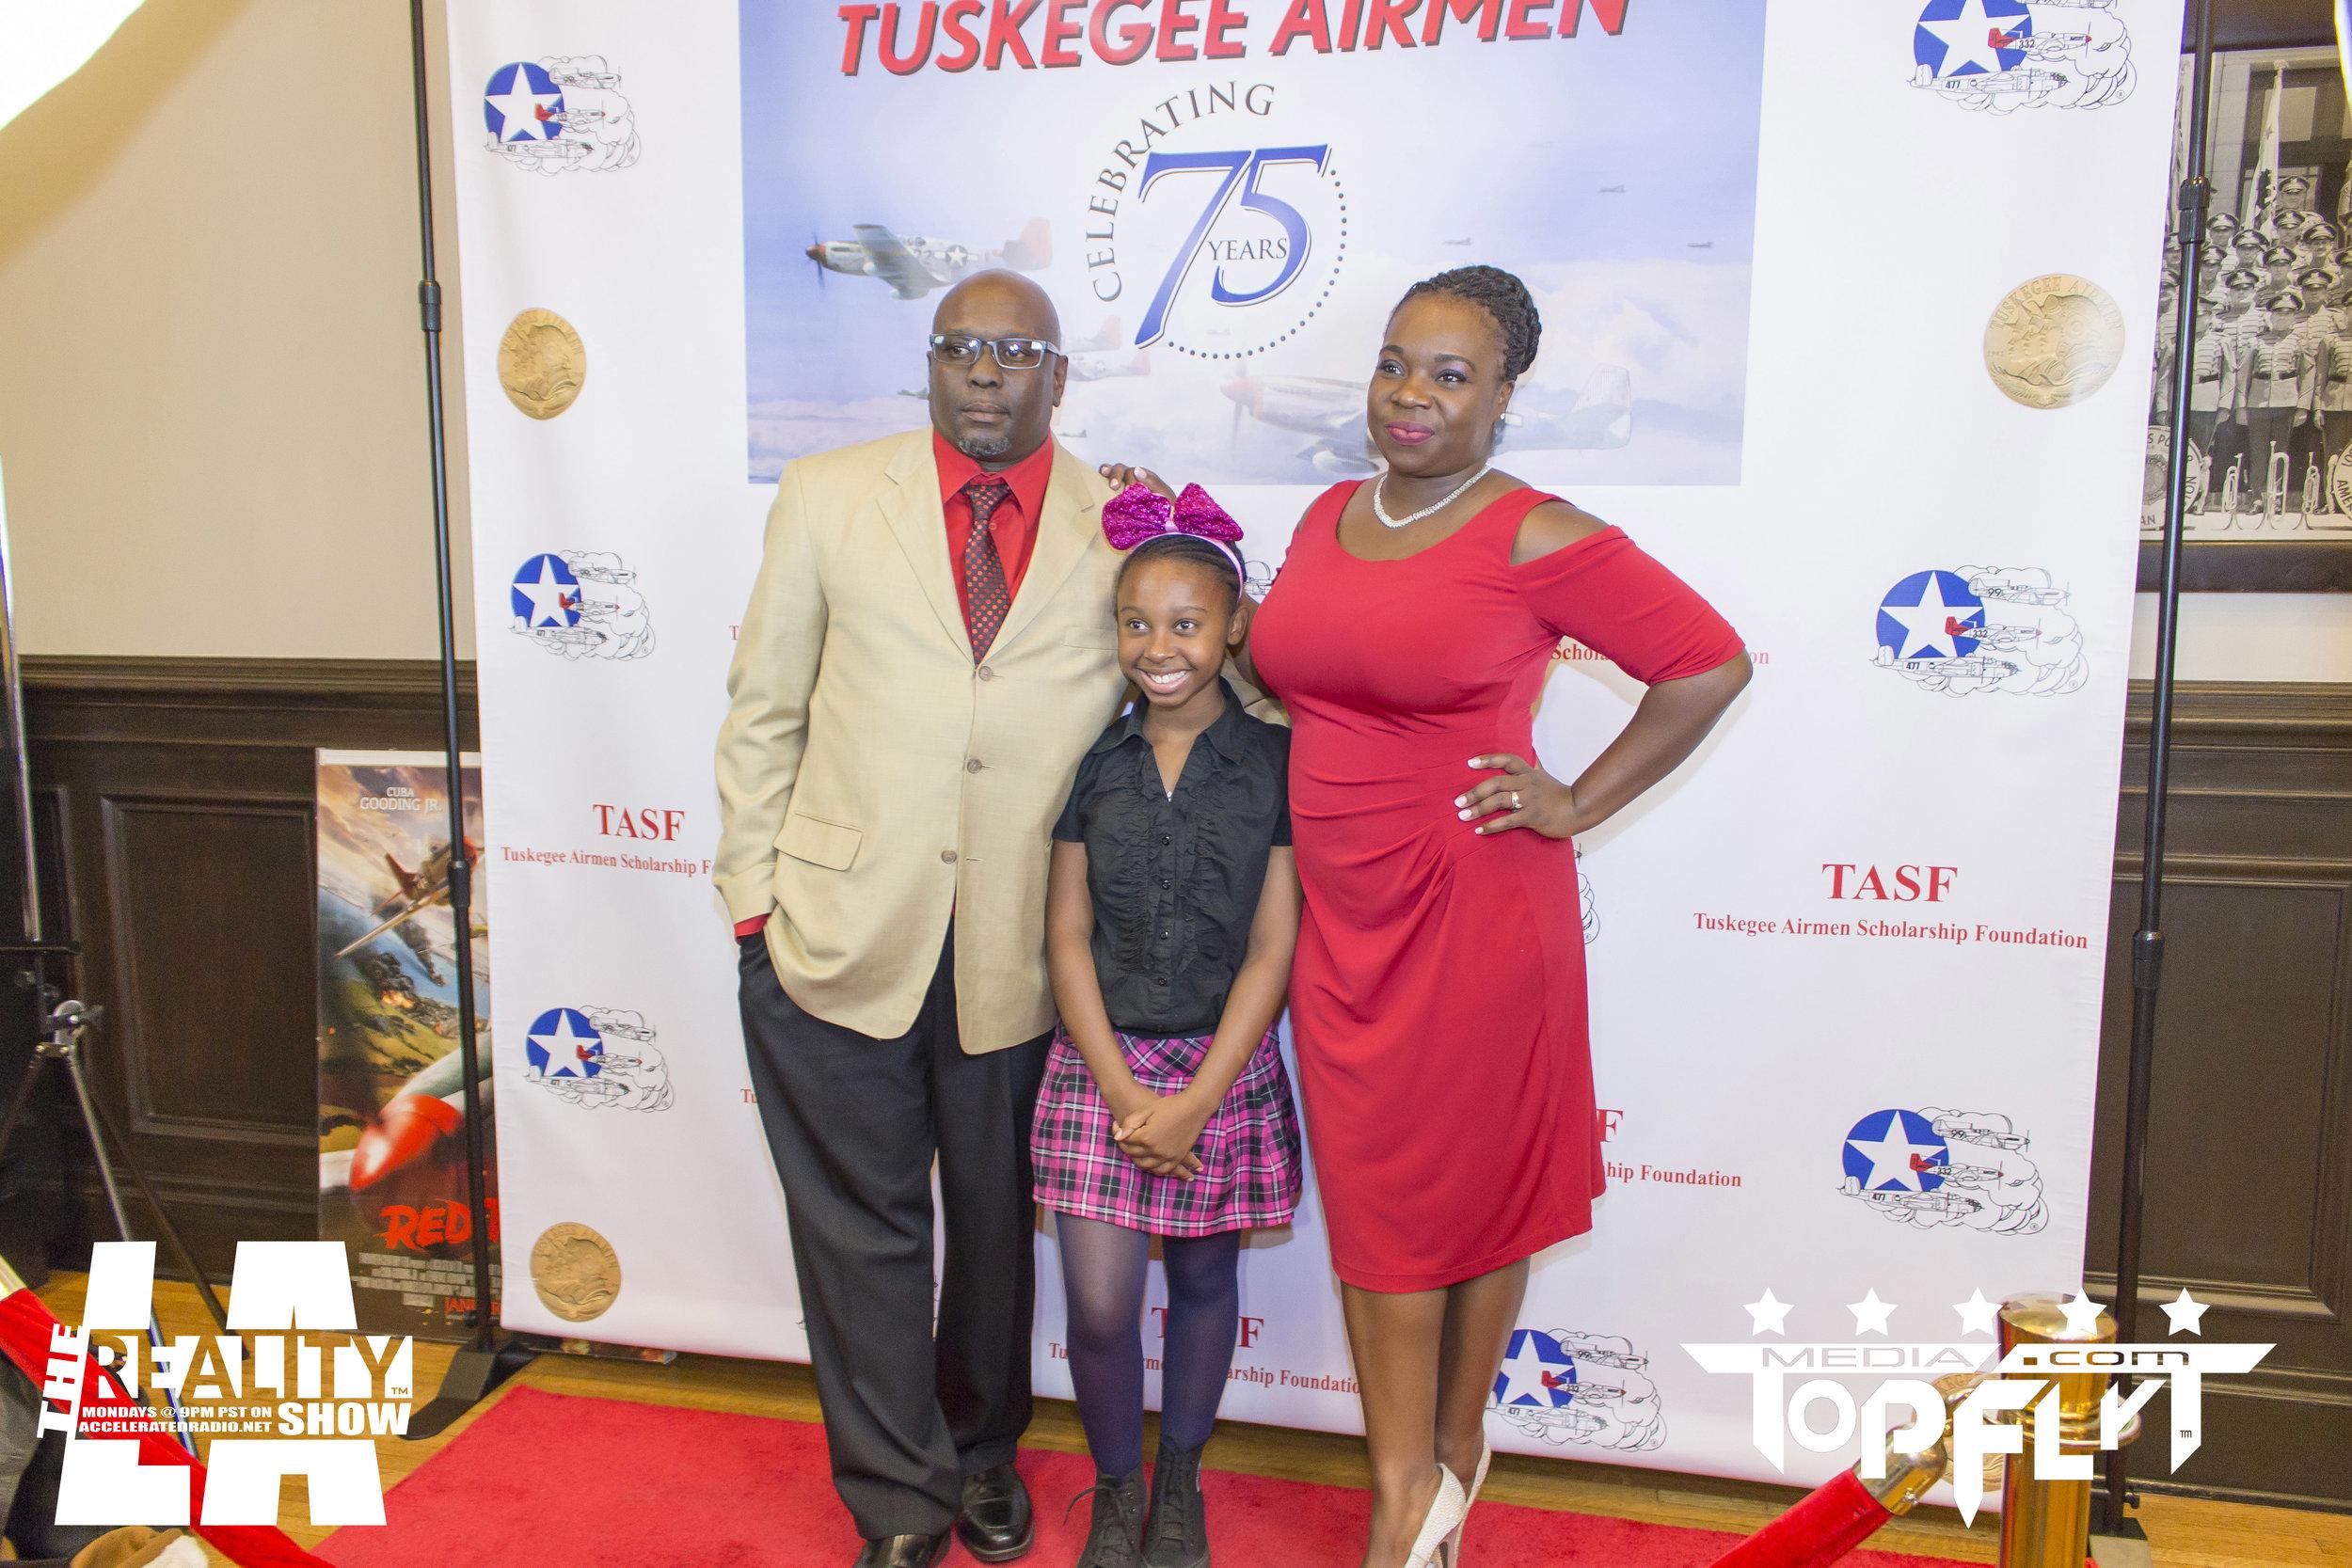 The Reality Show LA - Tuskegee Airmen 75th Anniversary VIP Reception_100.jpg